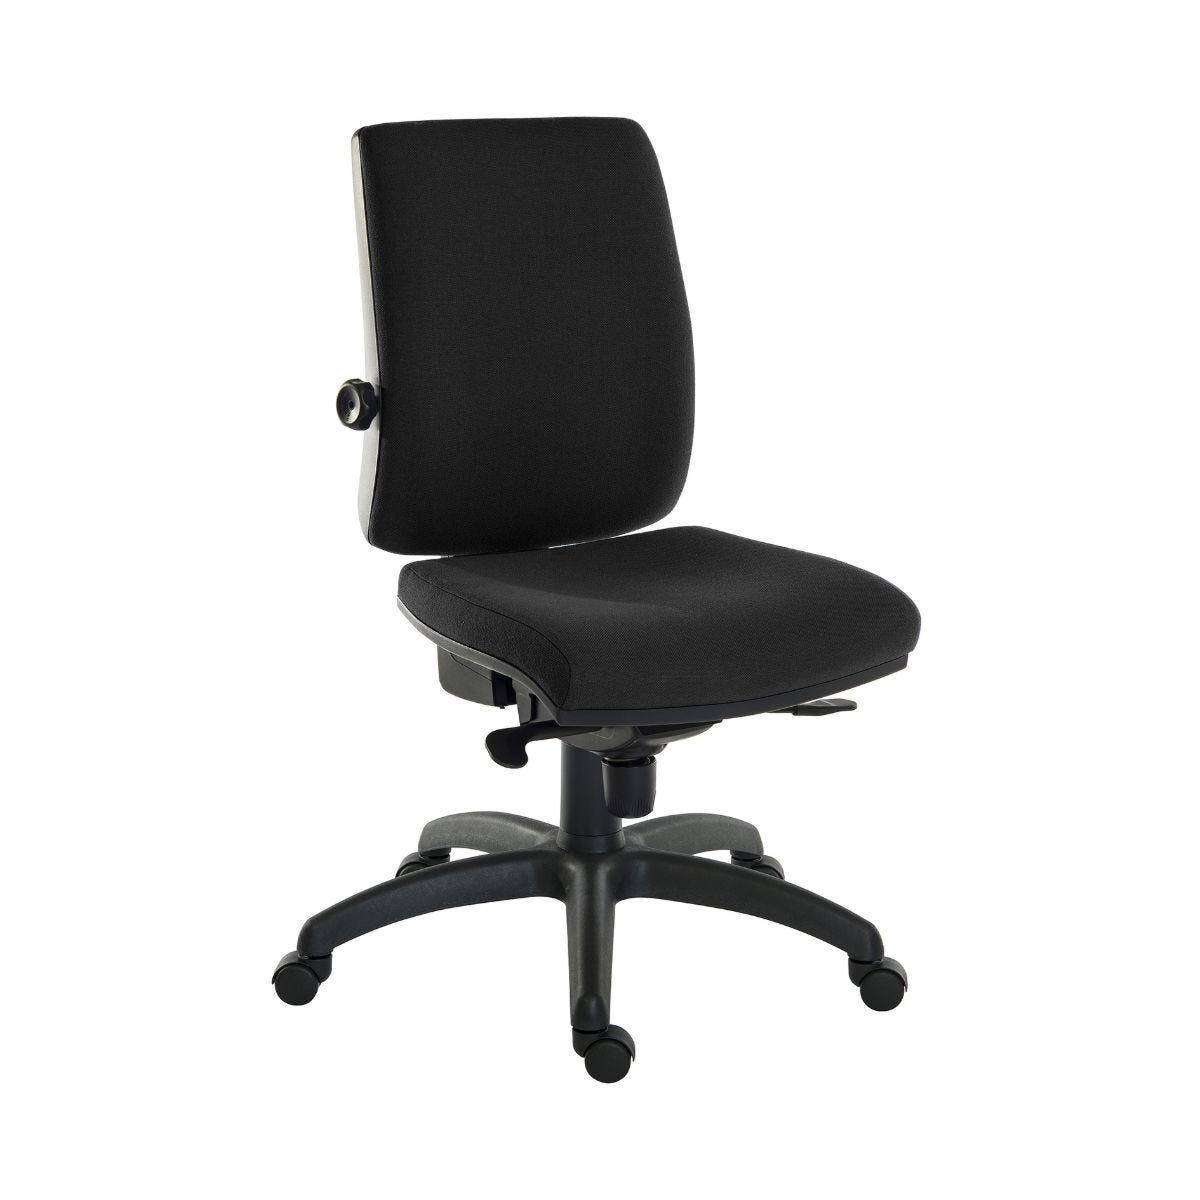 Teknik Office Ergo Plus 24 Hour Ergonomic Executive Operator Chair Black